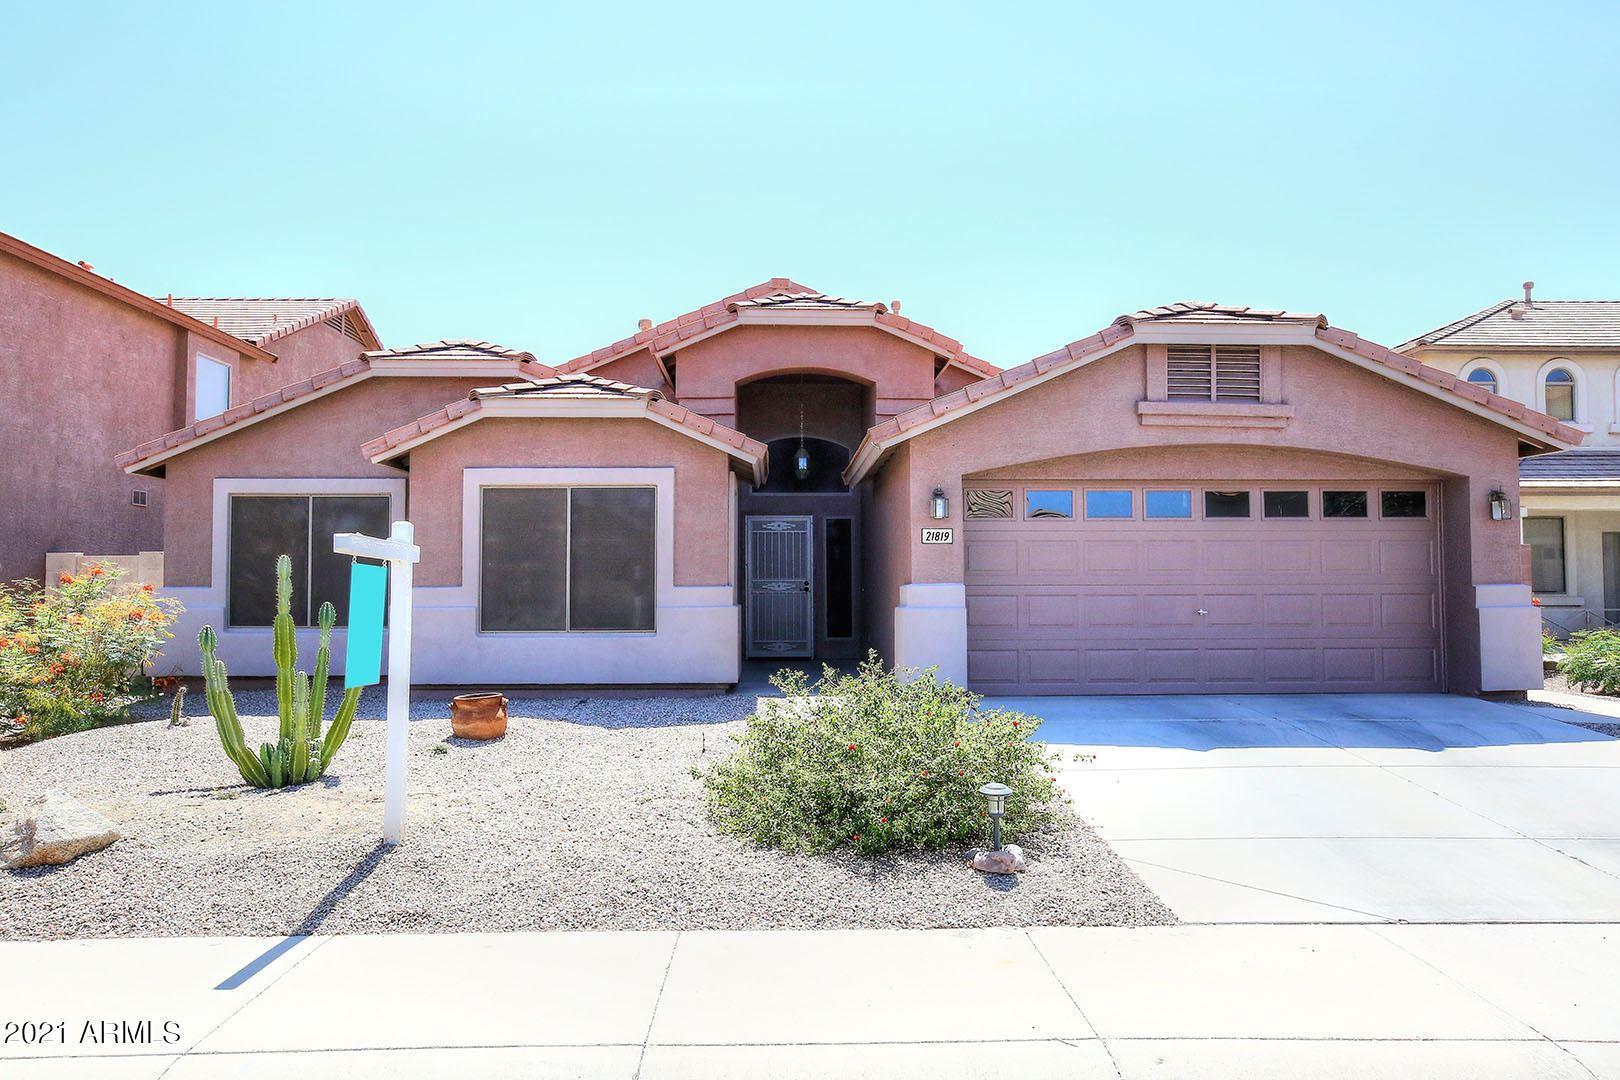 Photo for 21819 N BACKUS Drive, Maricopa, AZ 85138 (MLS # 6245503)